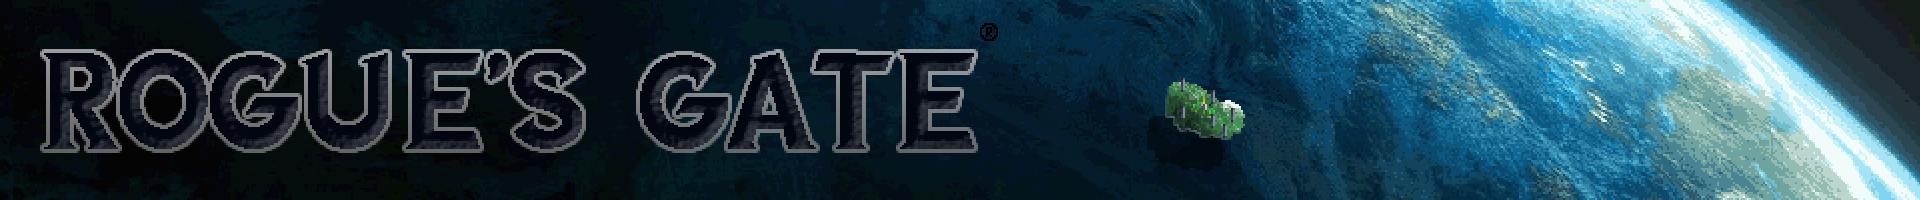 Rogue's Gate